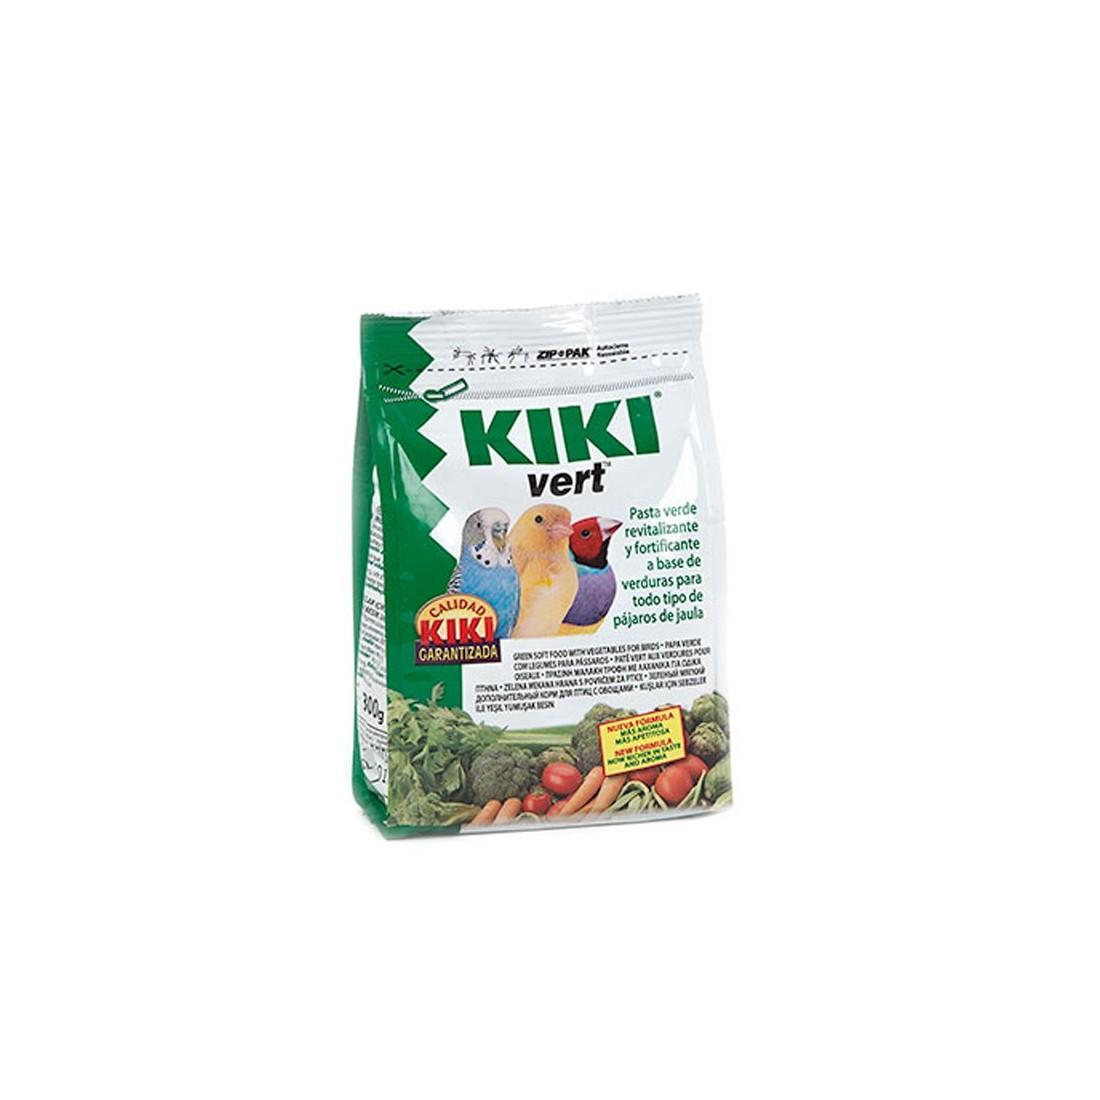 KIKI VERT - PASTA DE CRIA CON VERDURAS